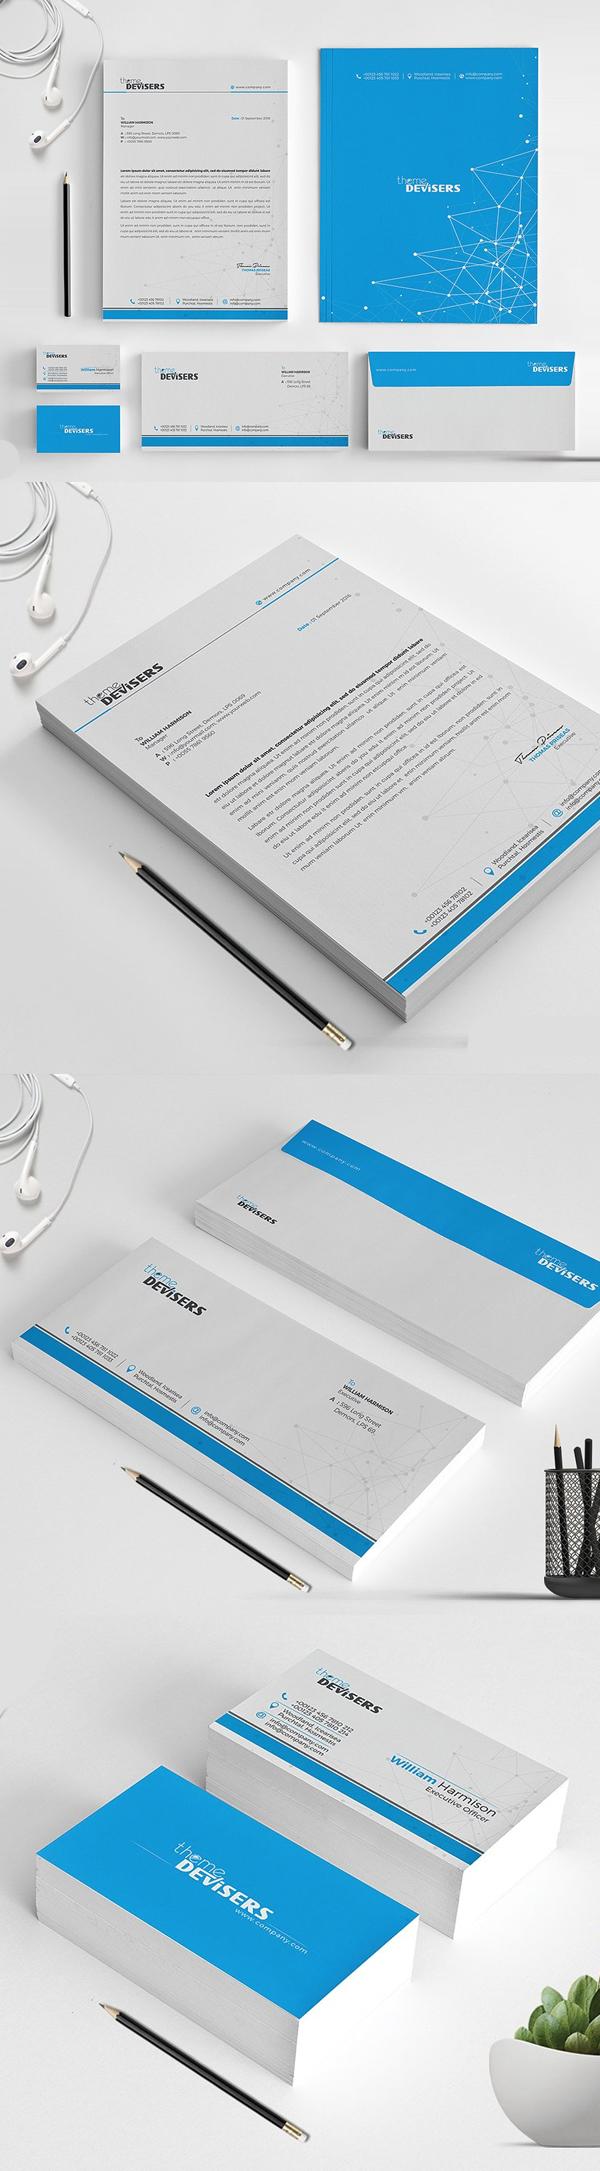 50 Professional Corporate Branding / Stationery Templates Design - 16